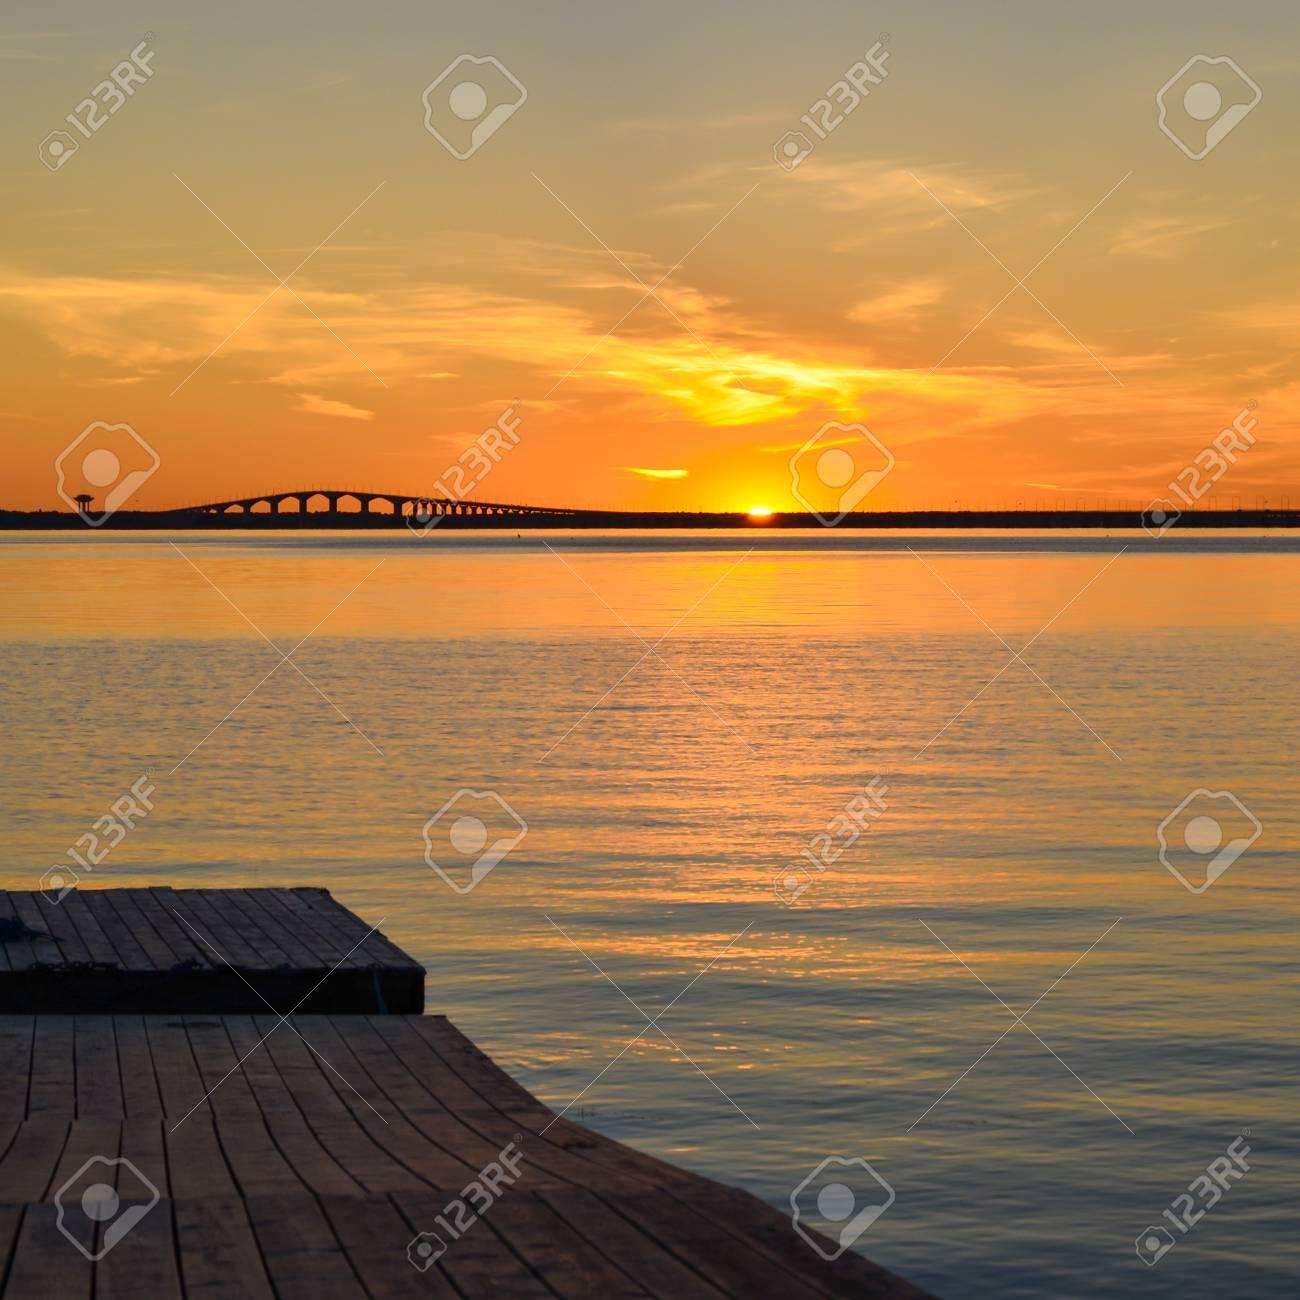 Sunset at the swedish Oland bridge in the Baltic sea Stock Photo - 21763932